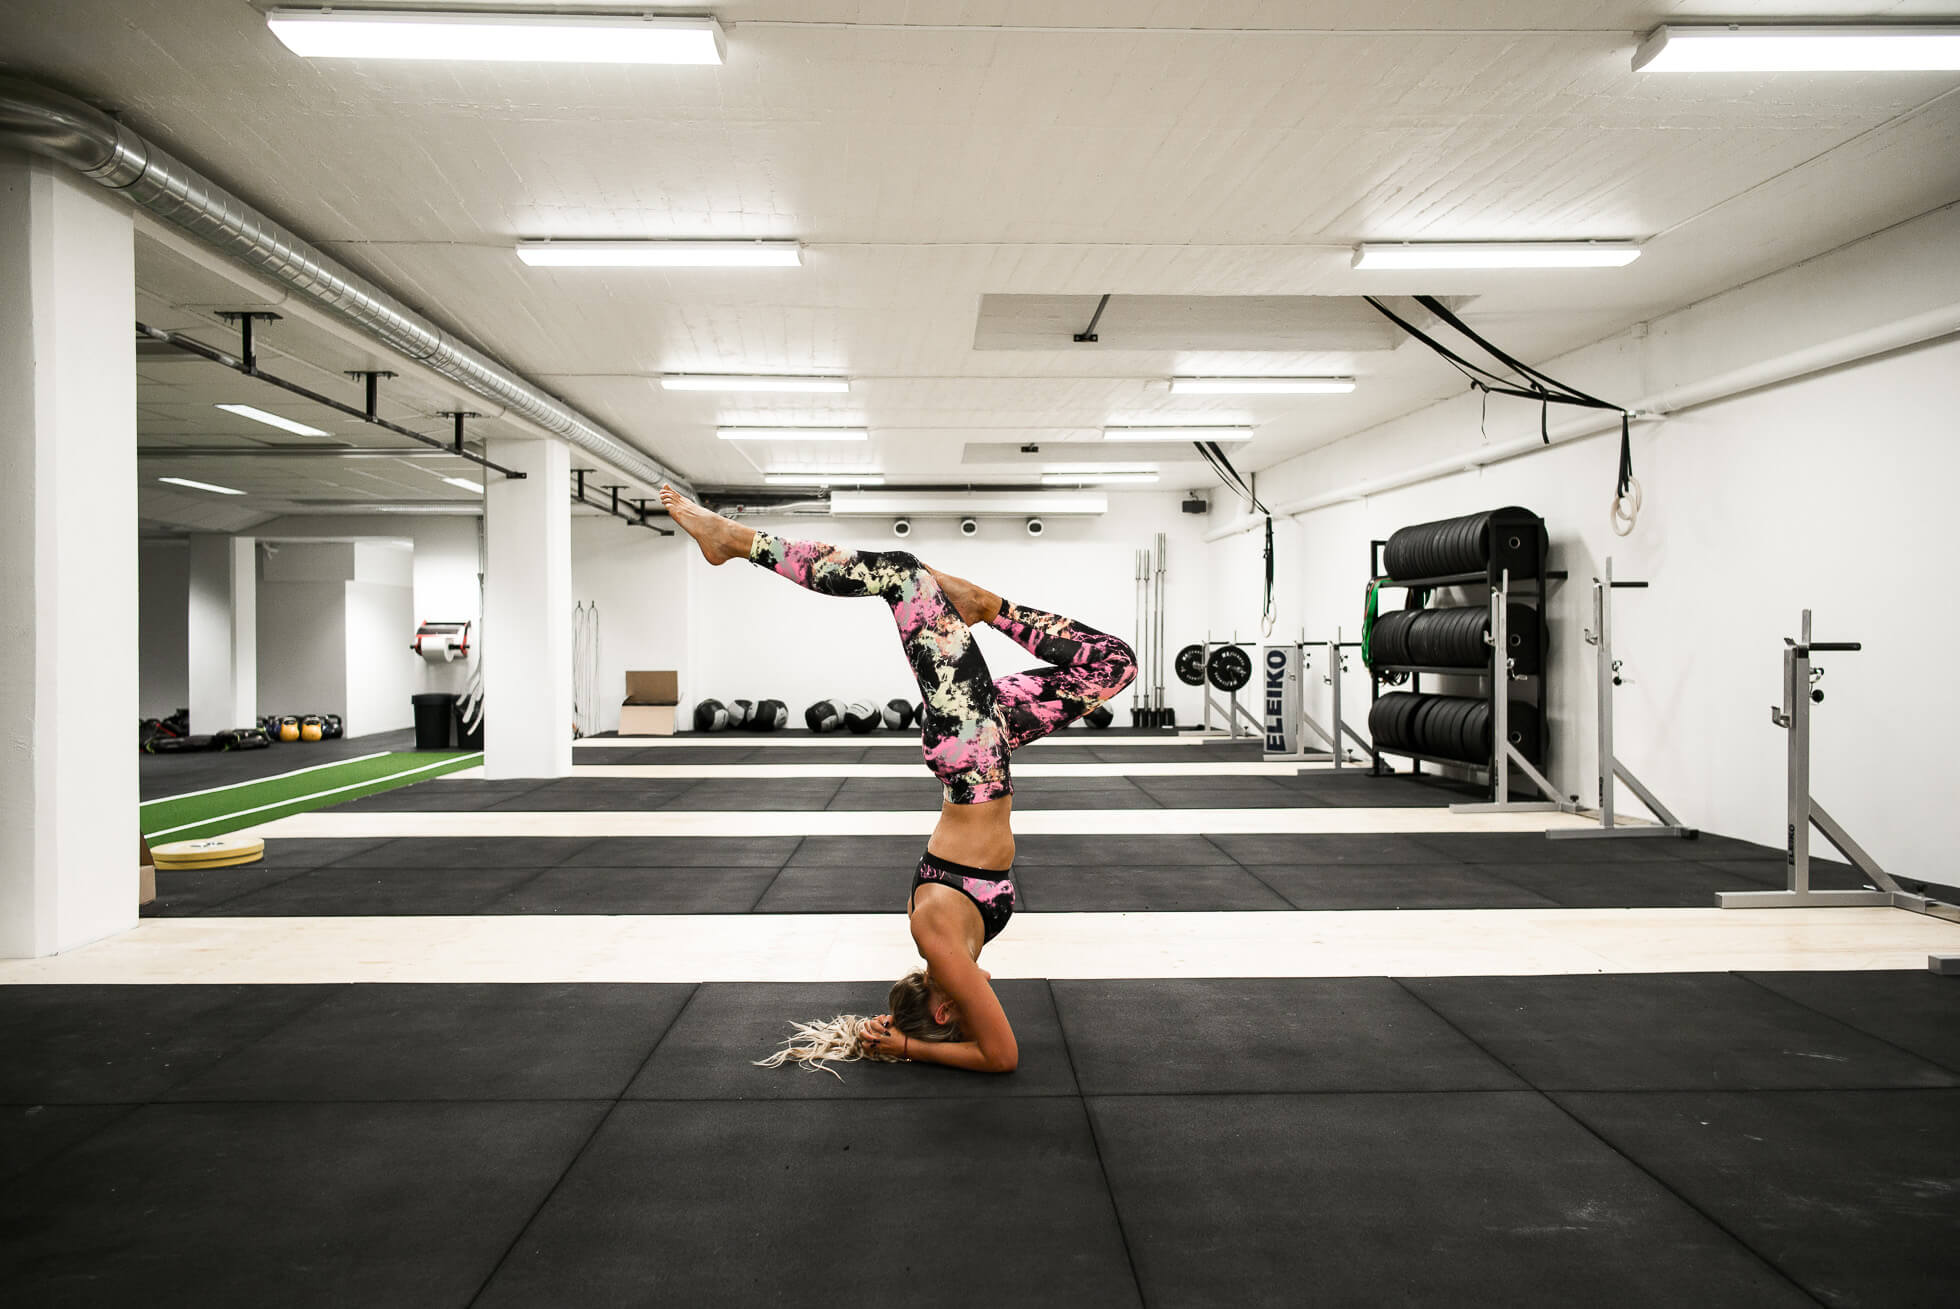 janni-deler-gym-crossfit-atum-stockholmL1000220